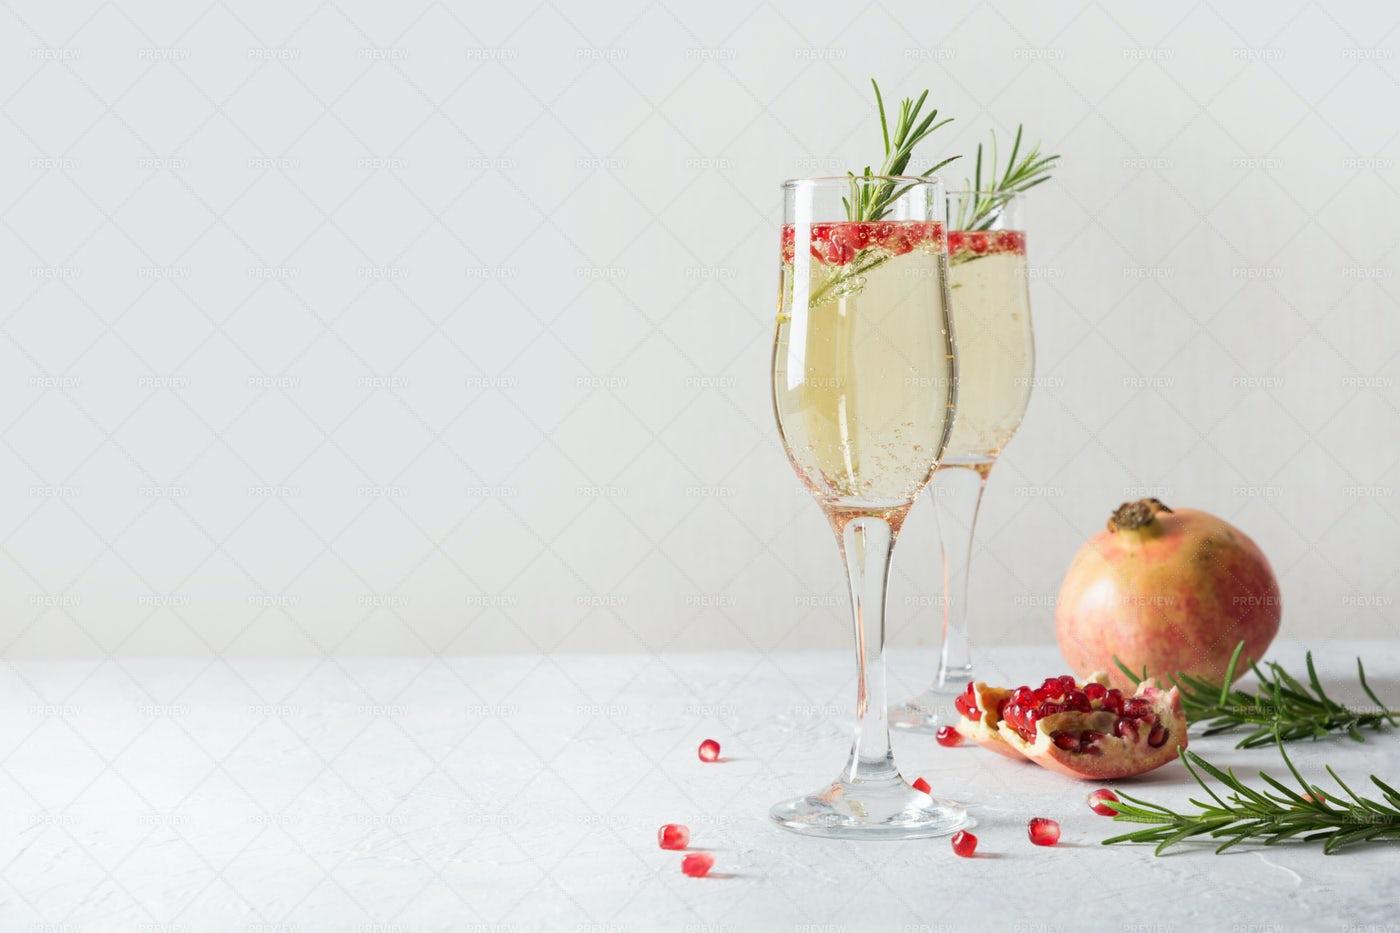 Sparkling Wine: Stock Photos